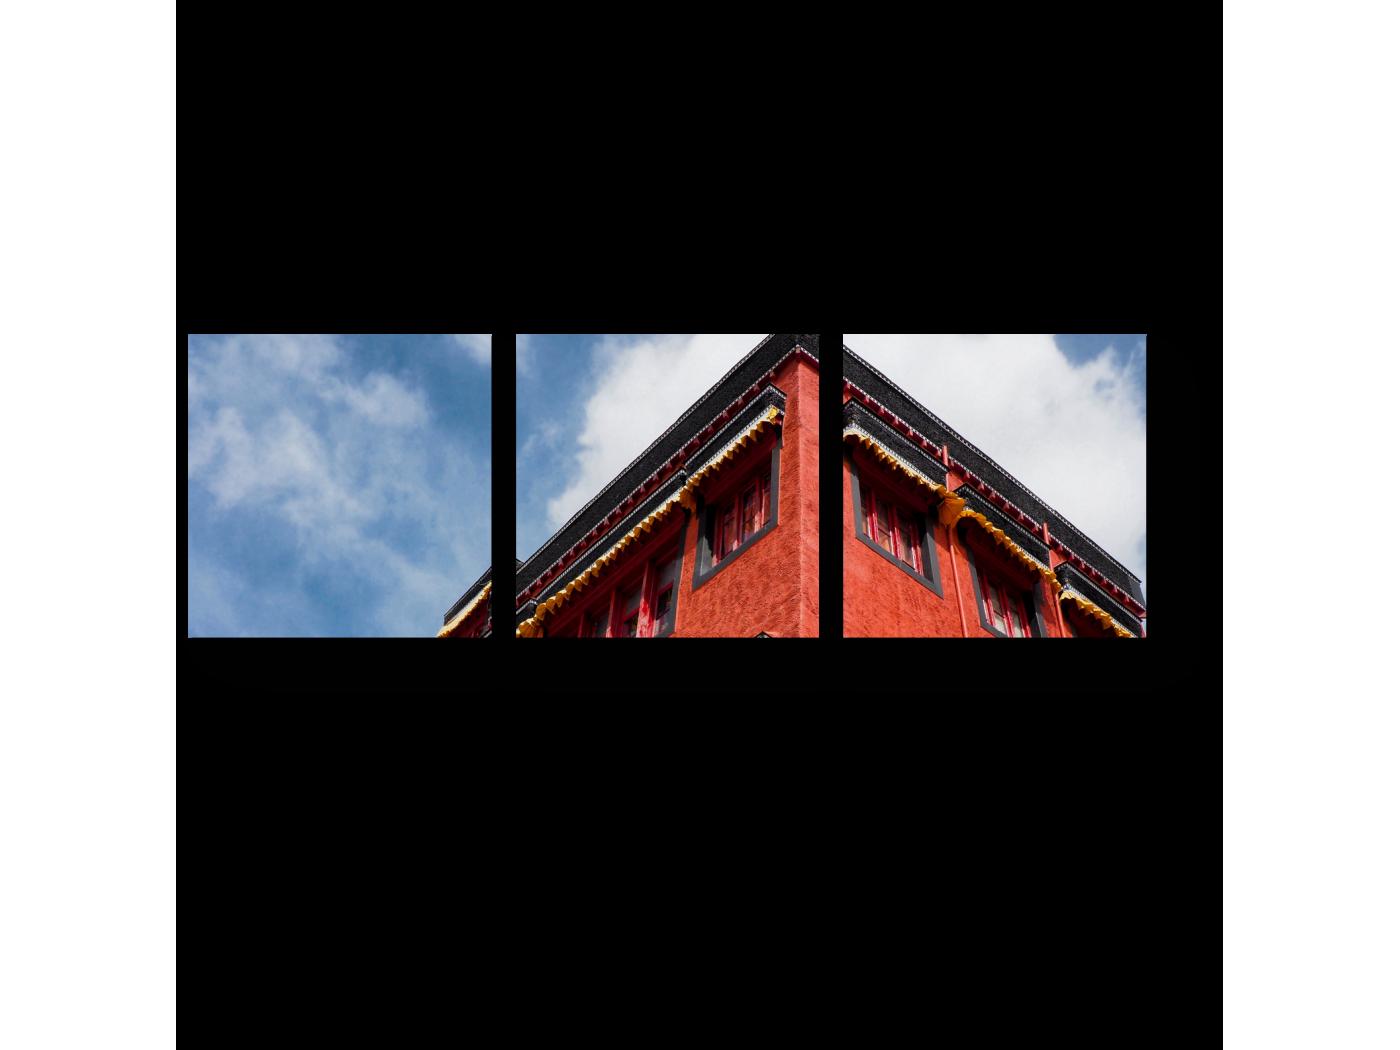 Модульная картина Тибетская архитектура (60x20) фото